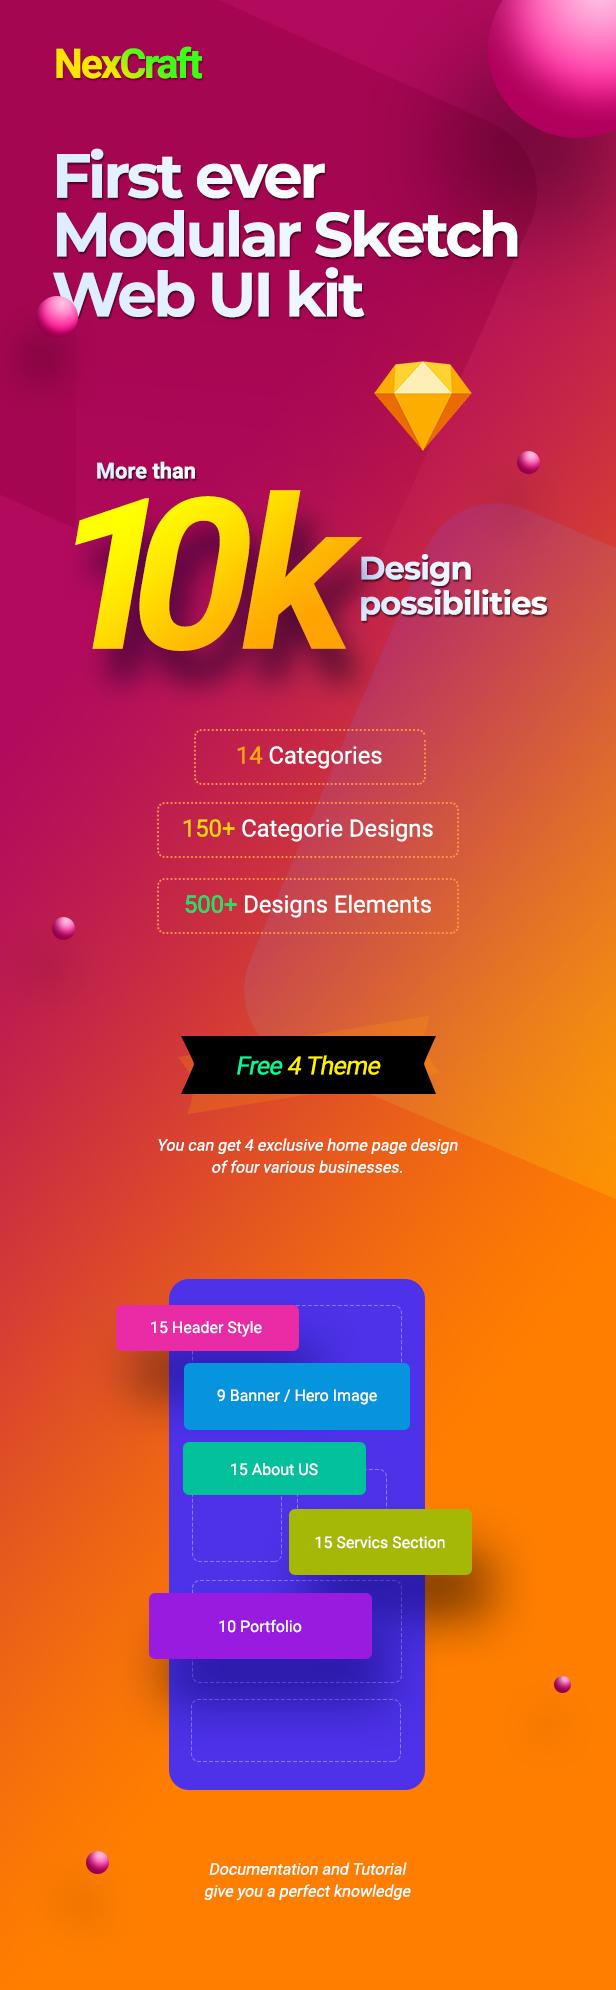 NexCraft | Modular Sketch Template and Web UI Kit - 1